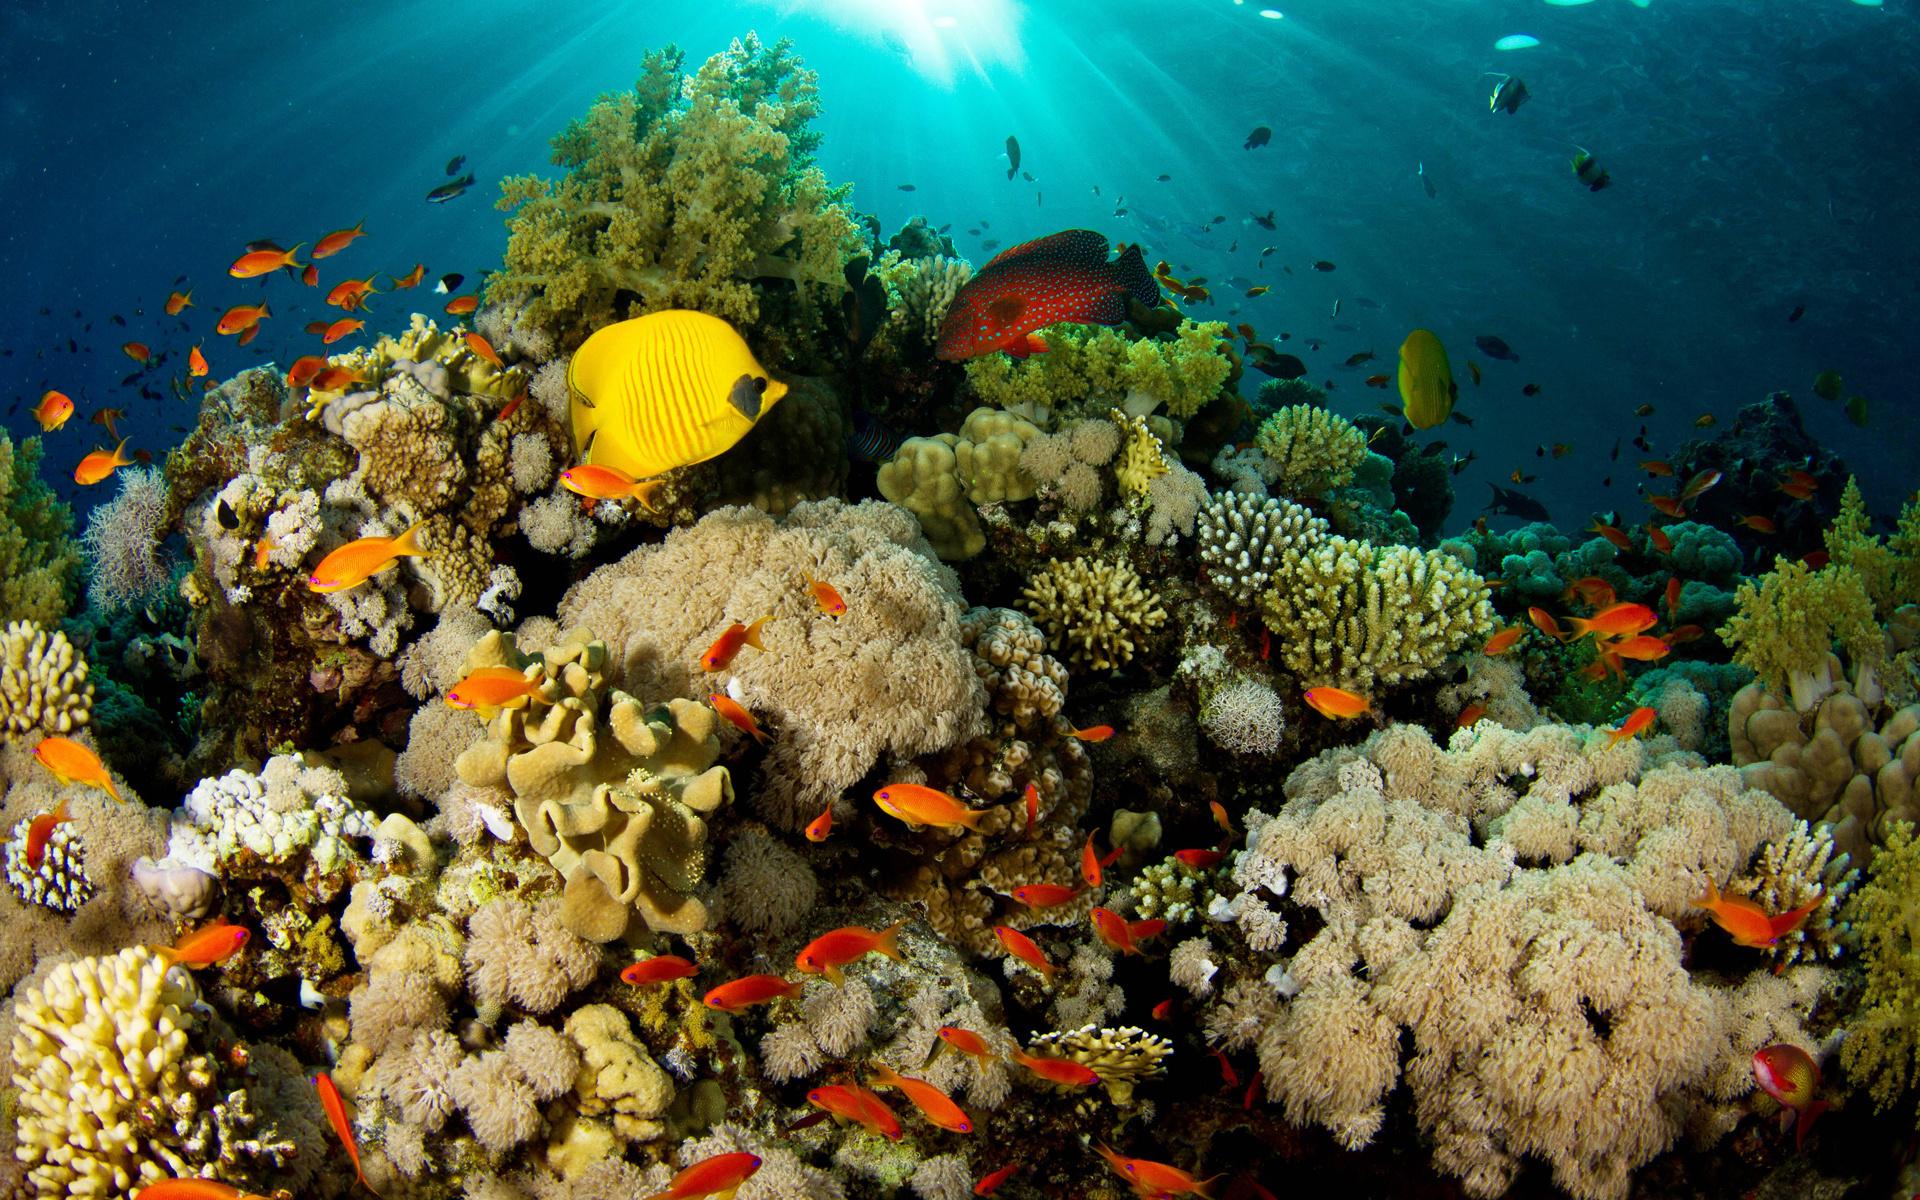 Открытки котятами, картинка с кораллами